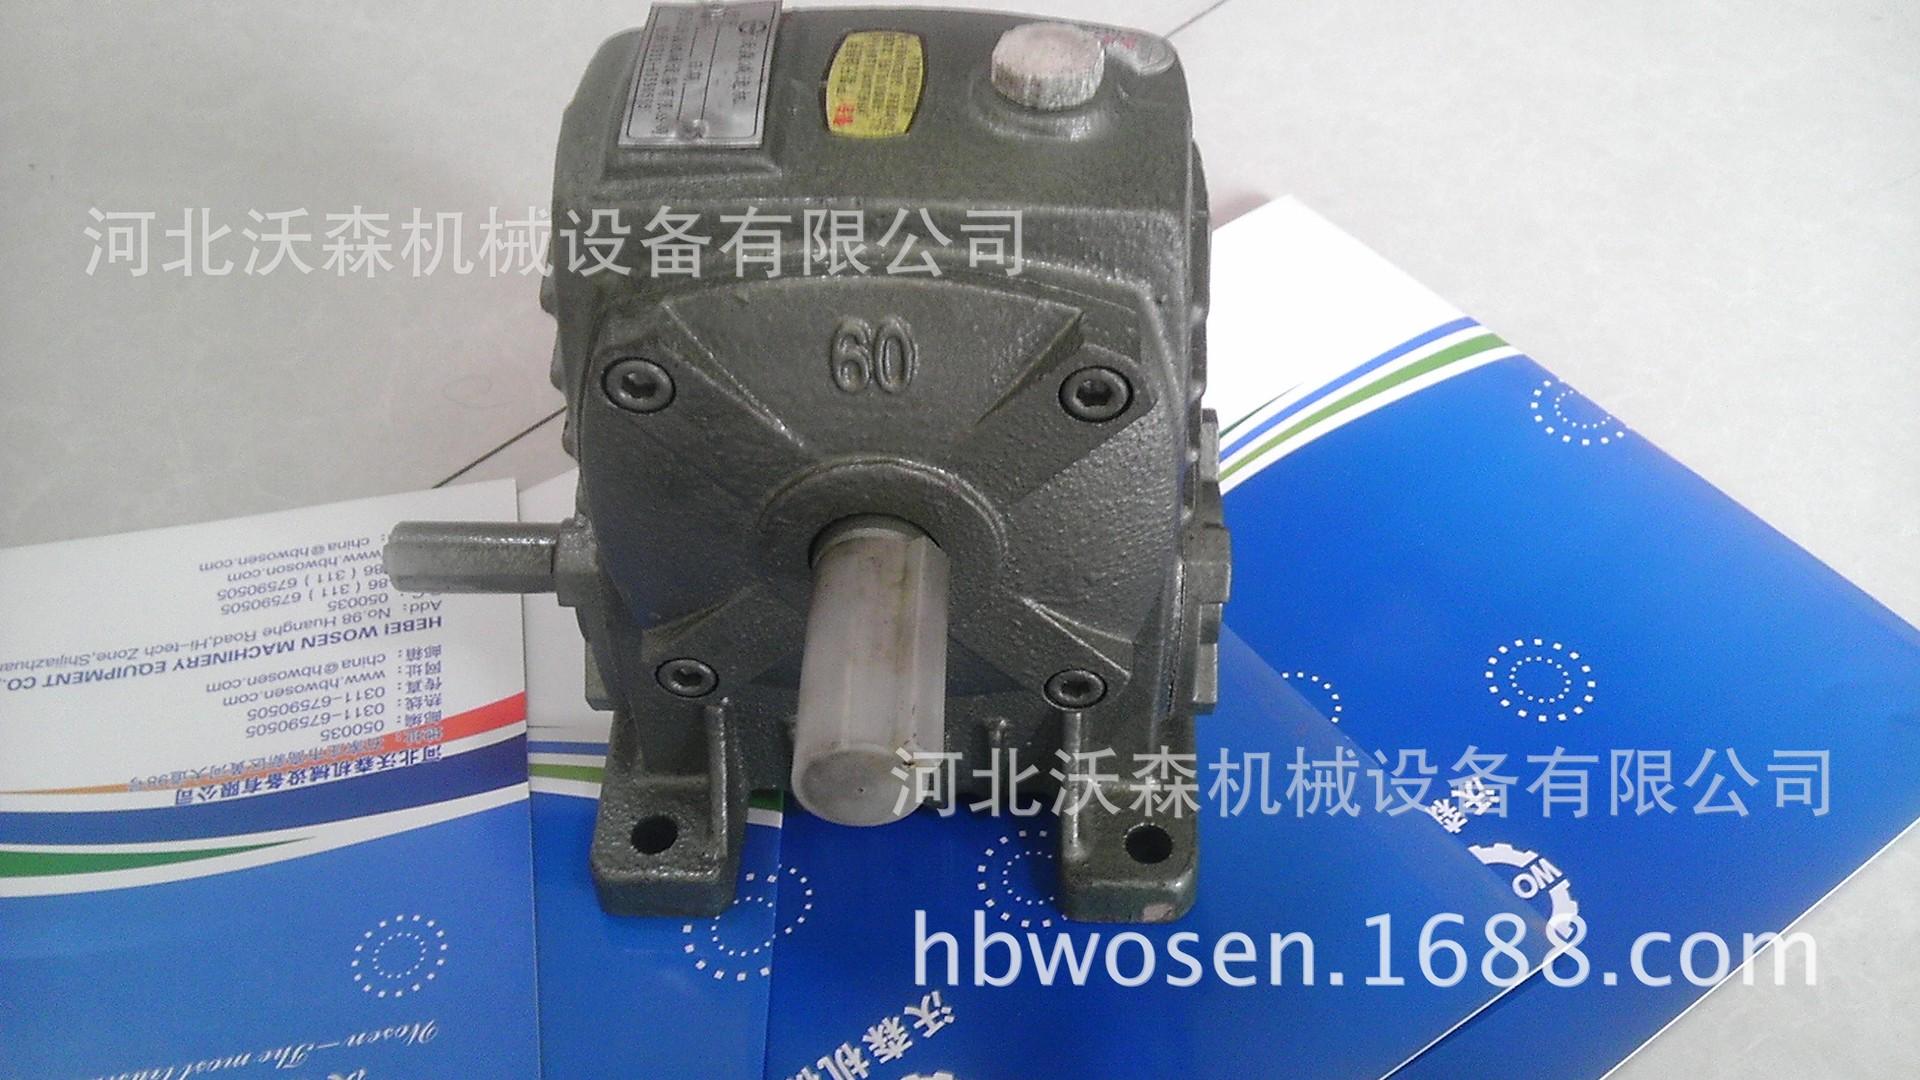 WPA系列蜗轮蜗杆减速机,涡轮减速机,蜗杆减速机